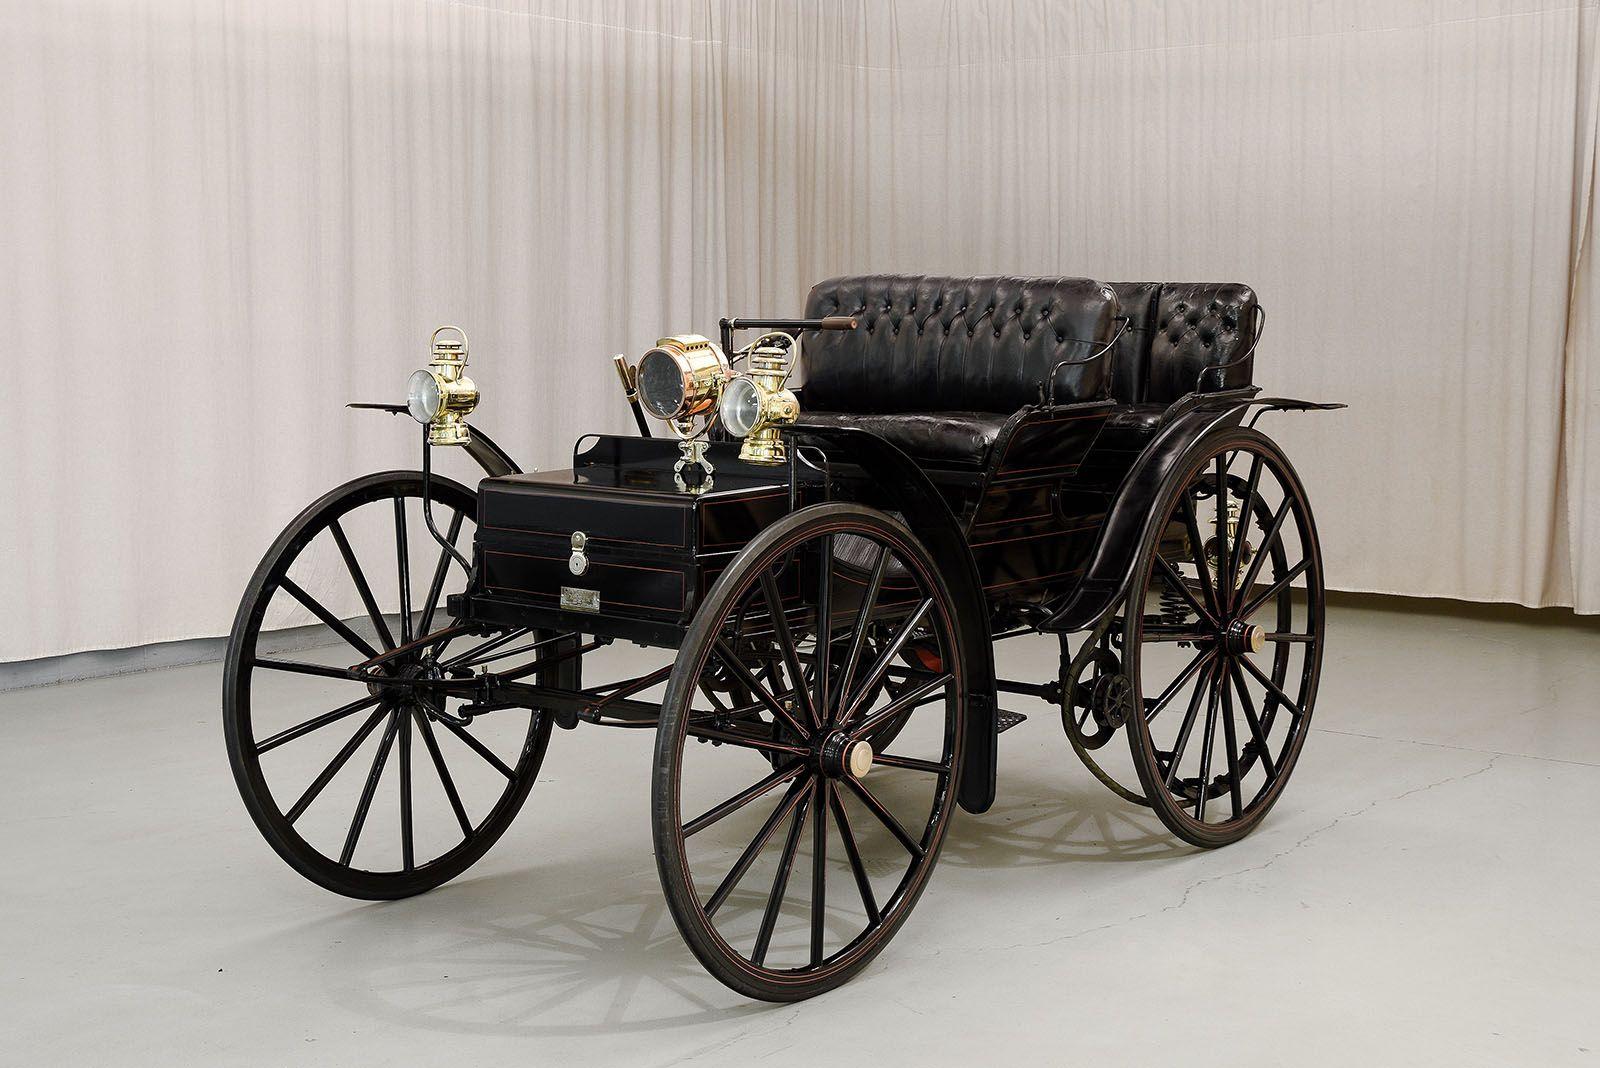 1908 Holsman H-11 Touring - Hyman Ltd. Classic Cars | Old Cars ...